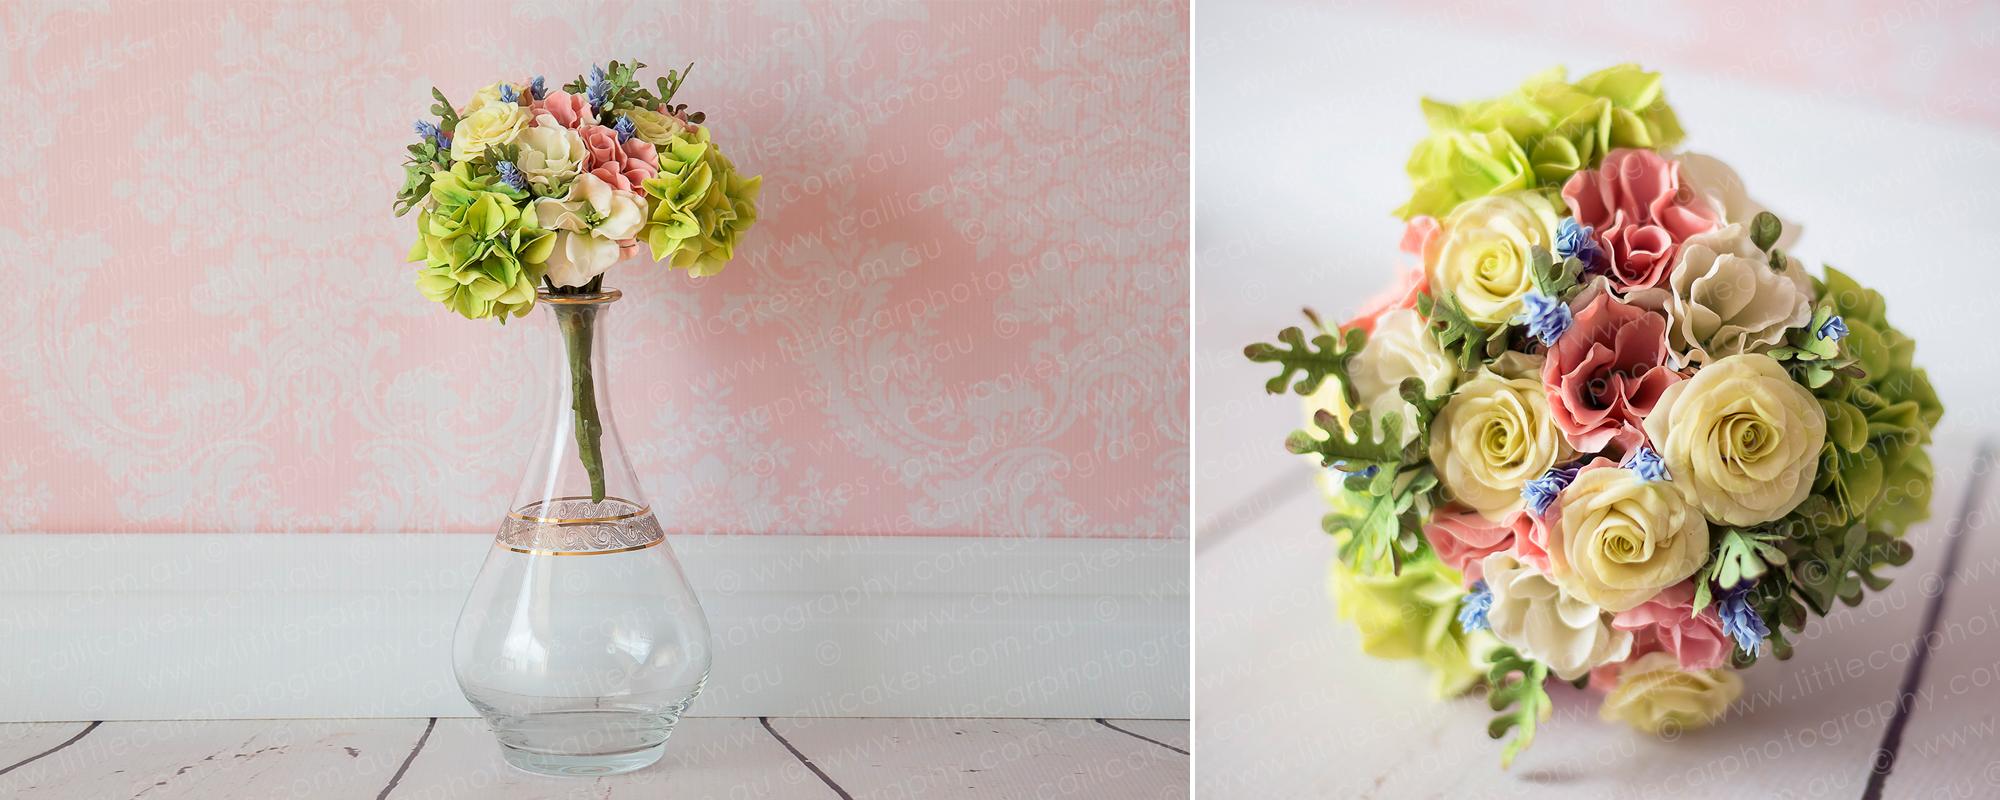 Wedding Photography of Cold Porcelin Art flower bouquet.jpg